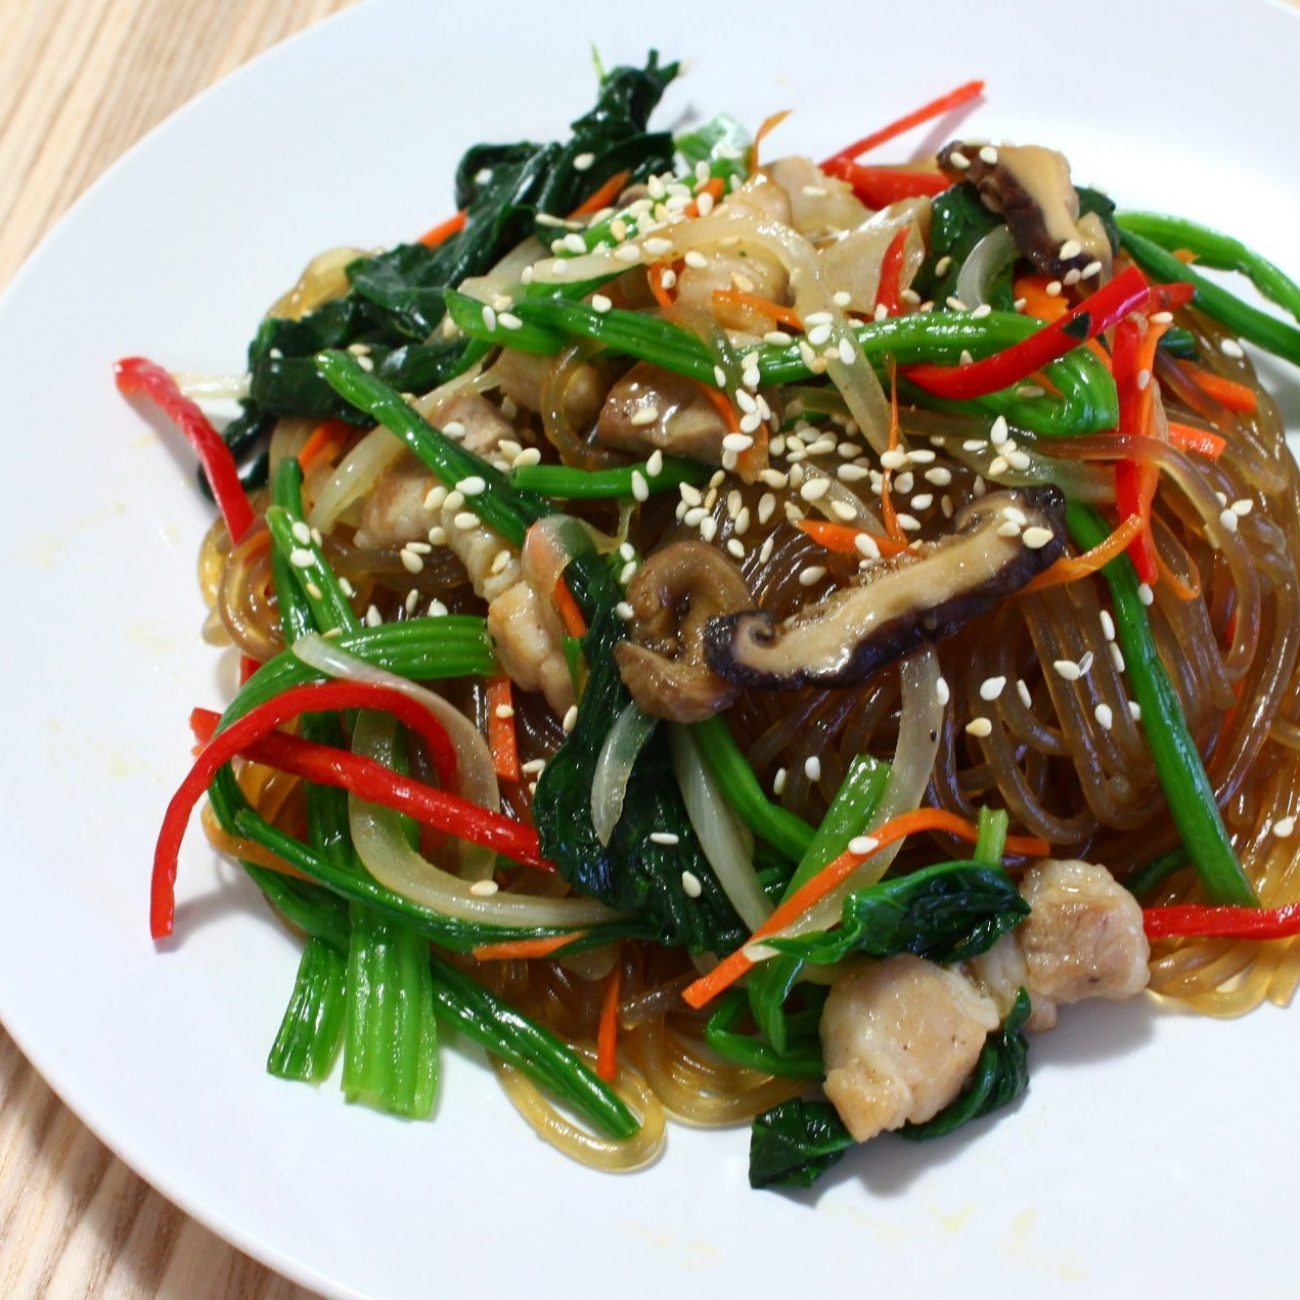 Japchae 잡채 (Stir-fried Sweet Potato Noodles)